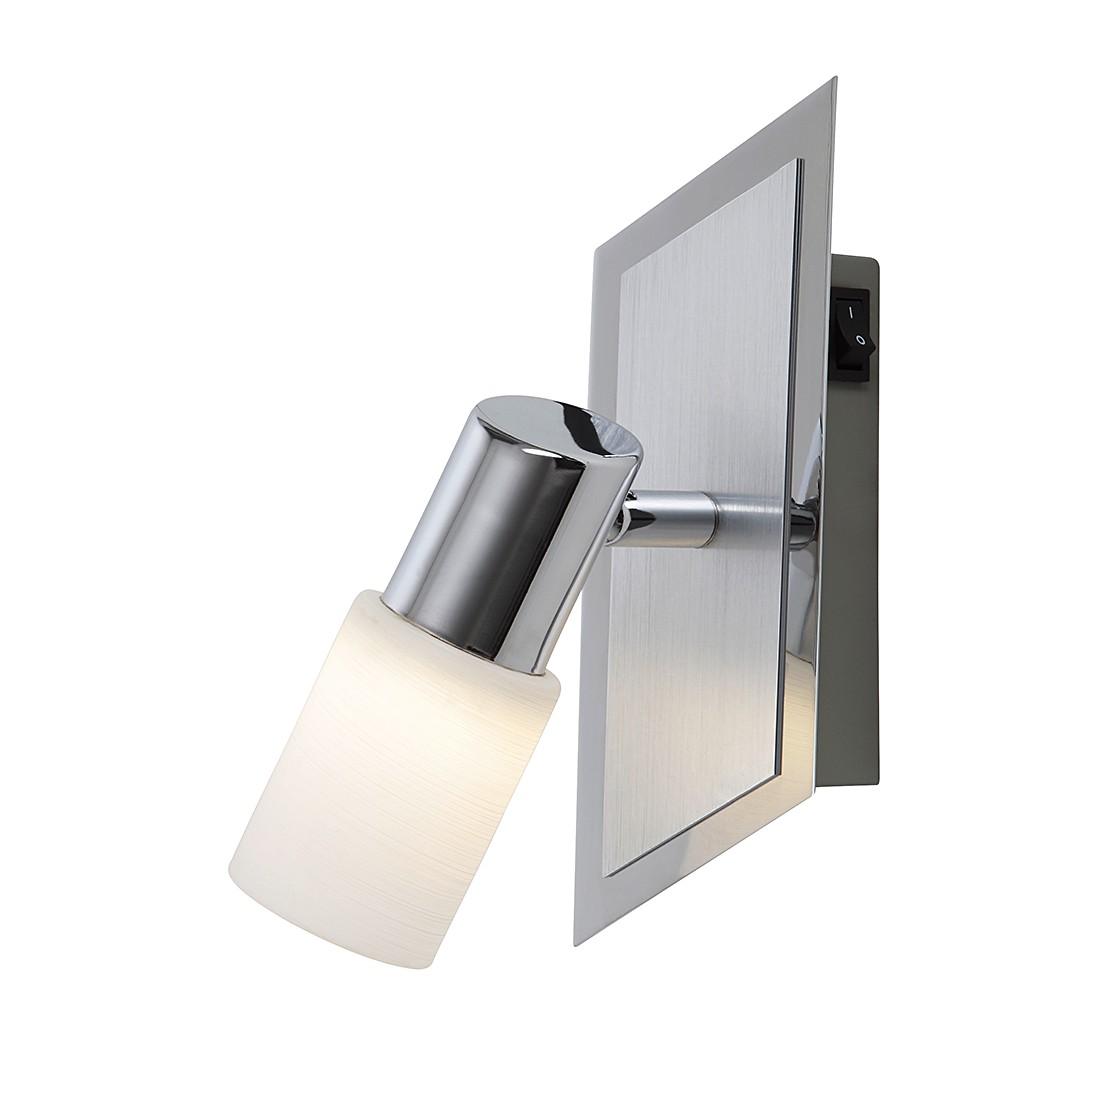 EEK A+, LED-Strahler – Metall – Aluminium – 1-flammig, Trio kaufen